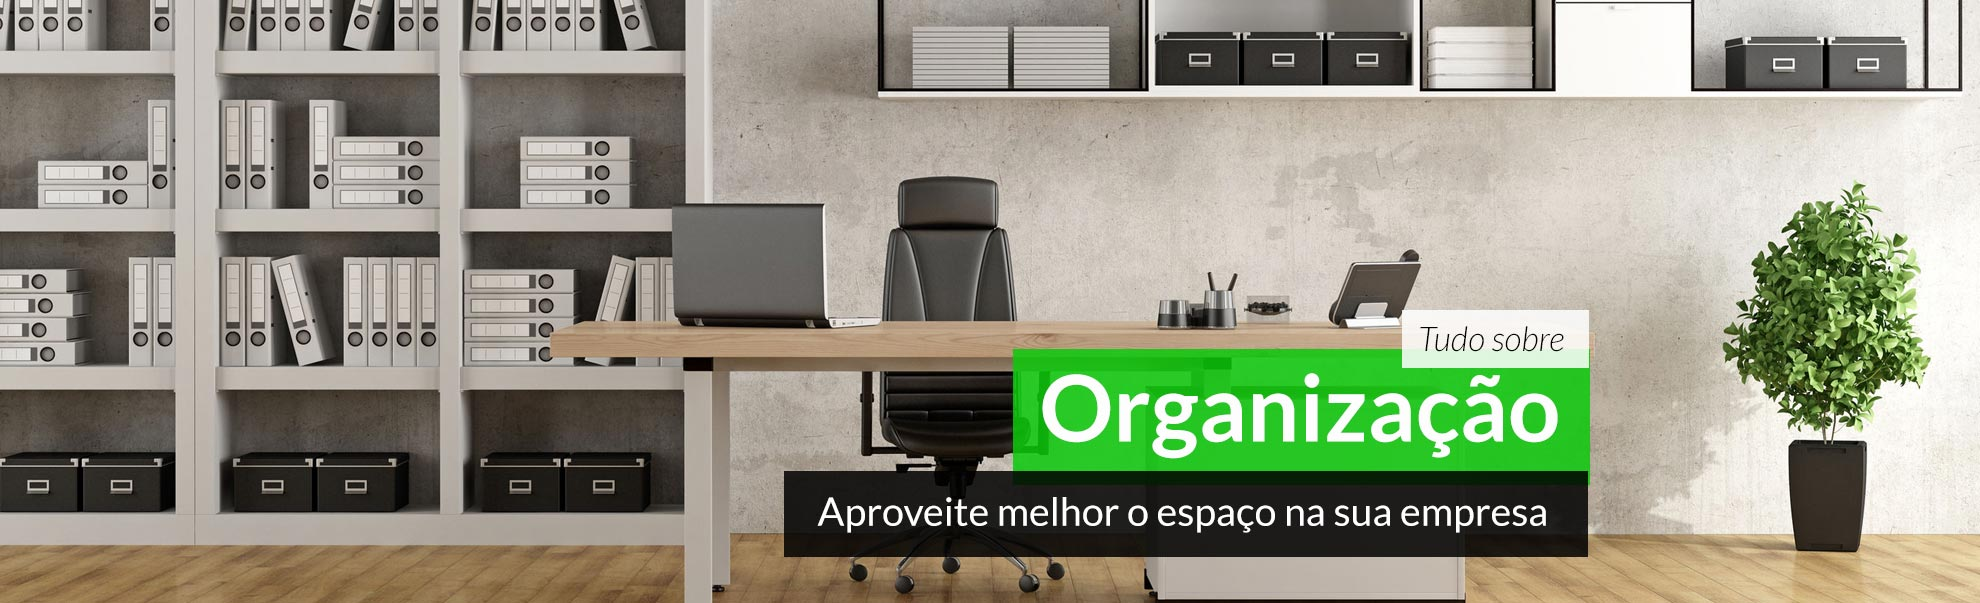 slider-self-storage-tudo-sobre-organiza